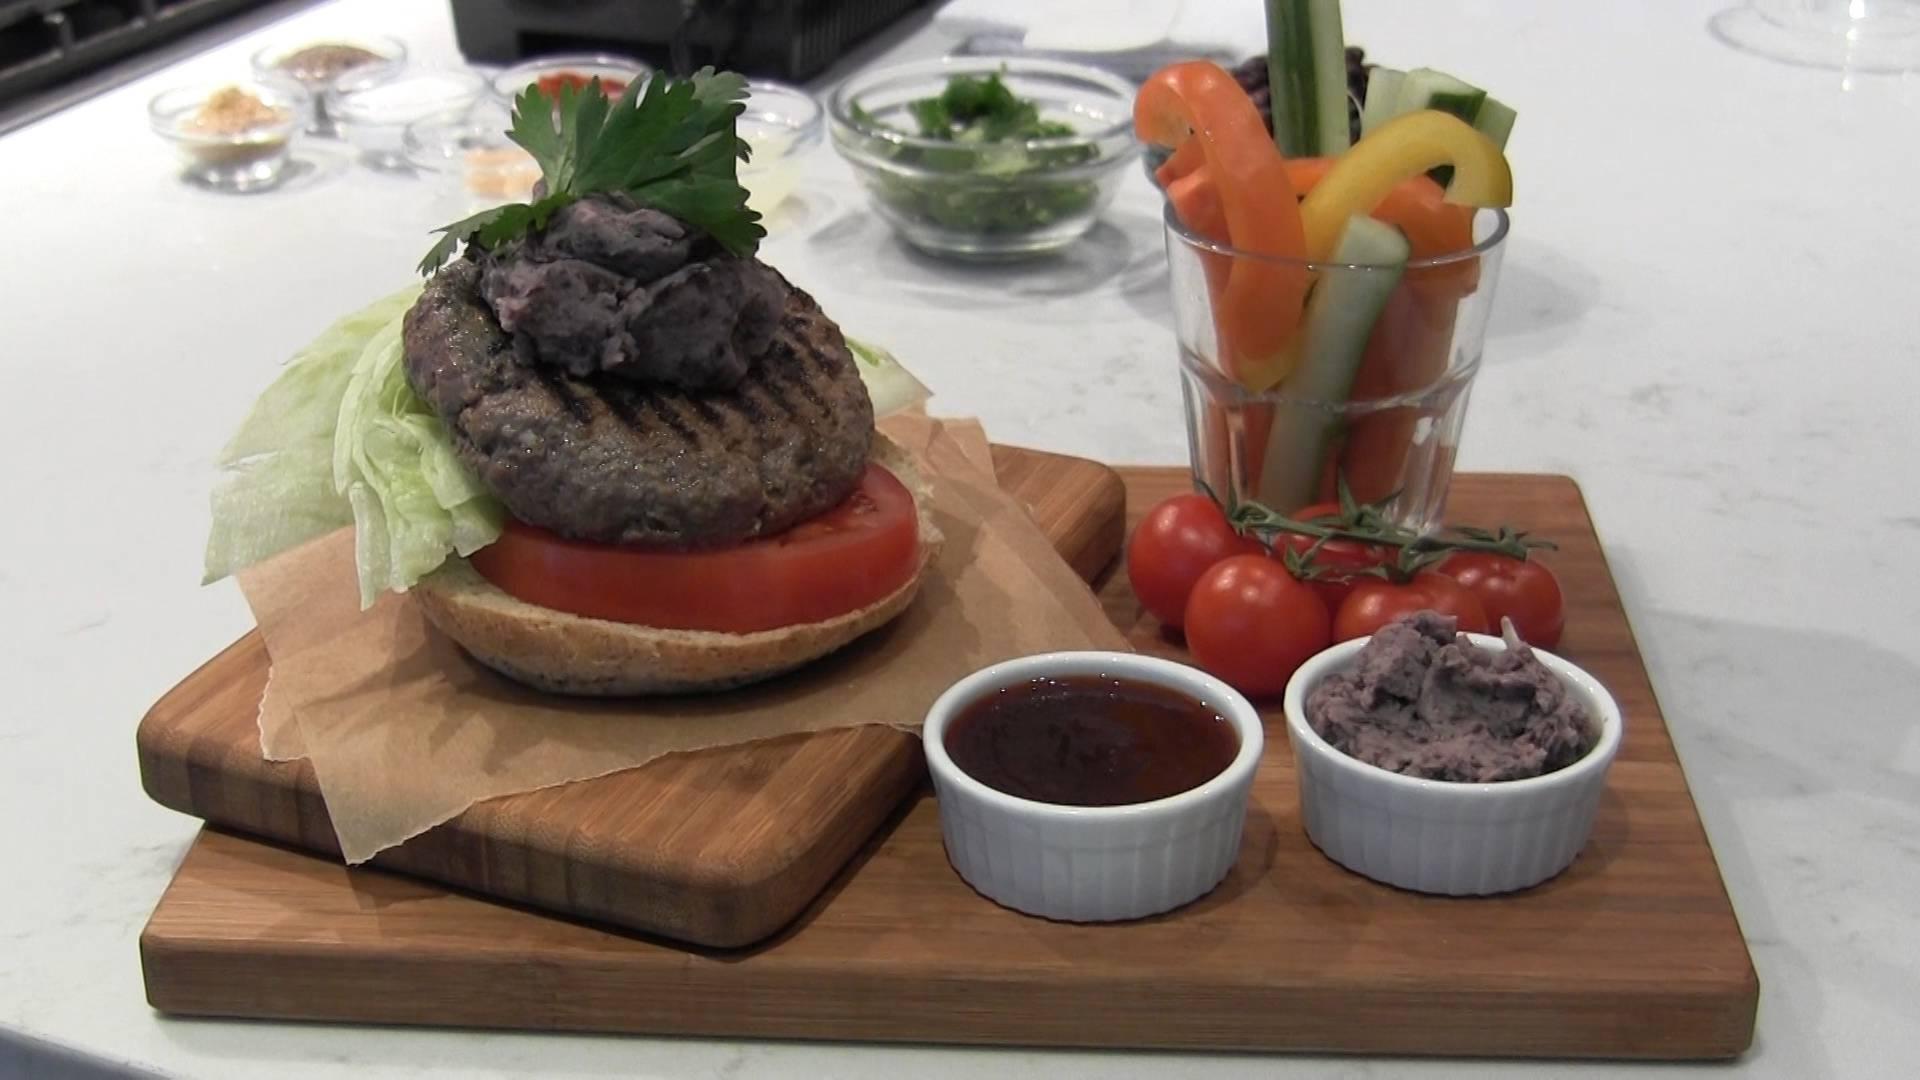 Culinary Coach: A Healthy Burger Idea for Summer